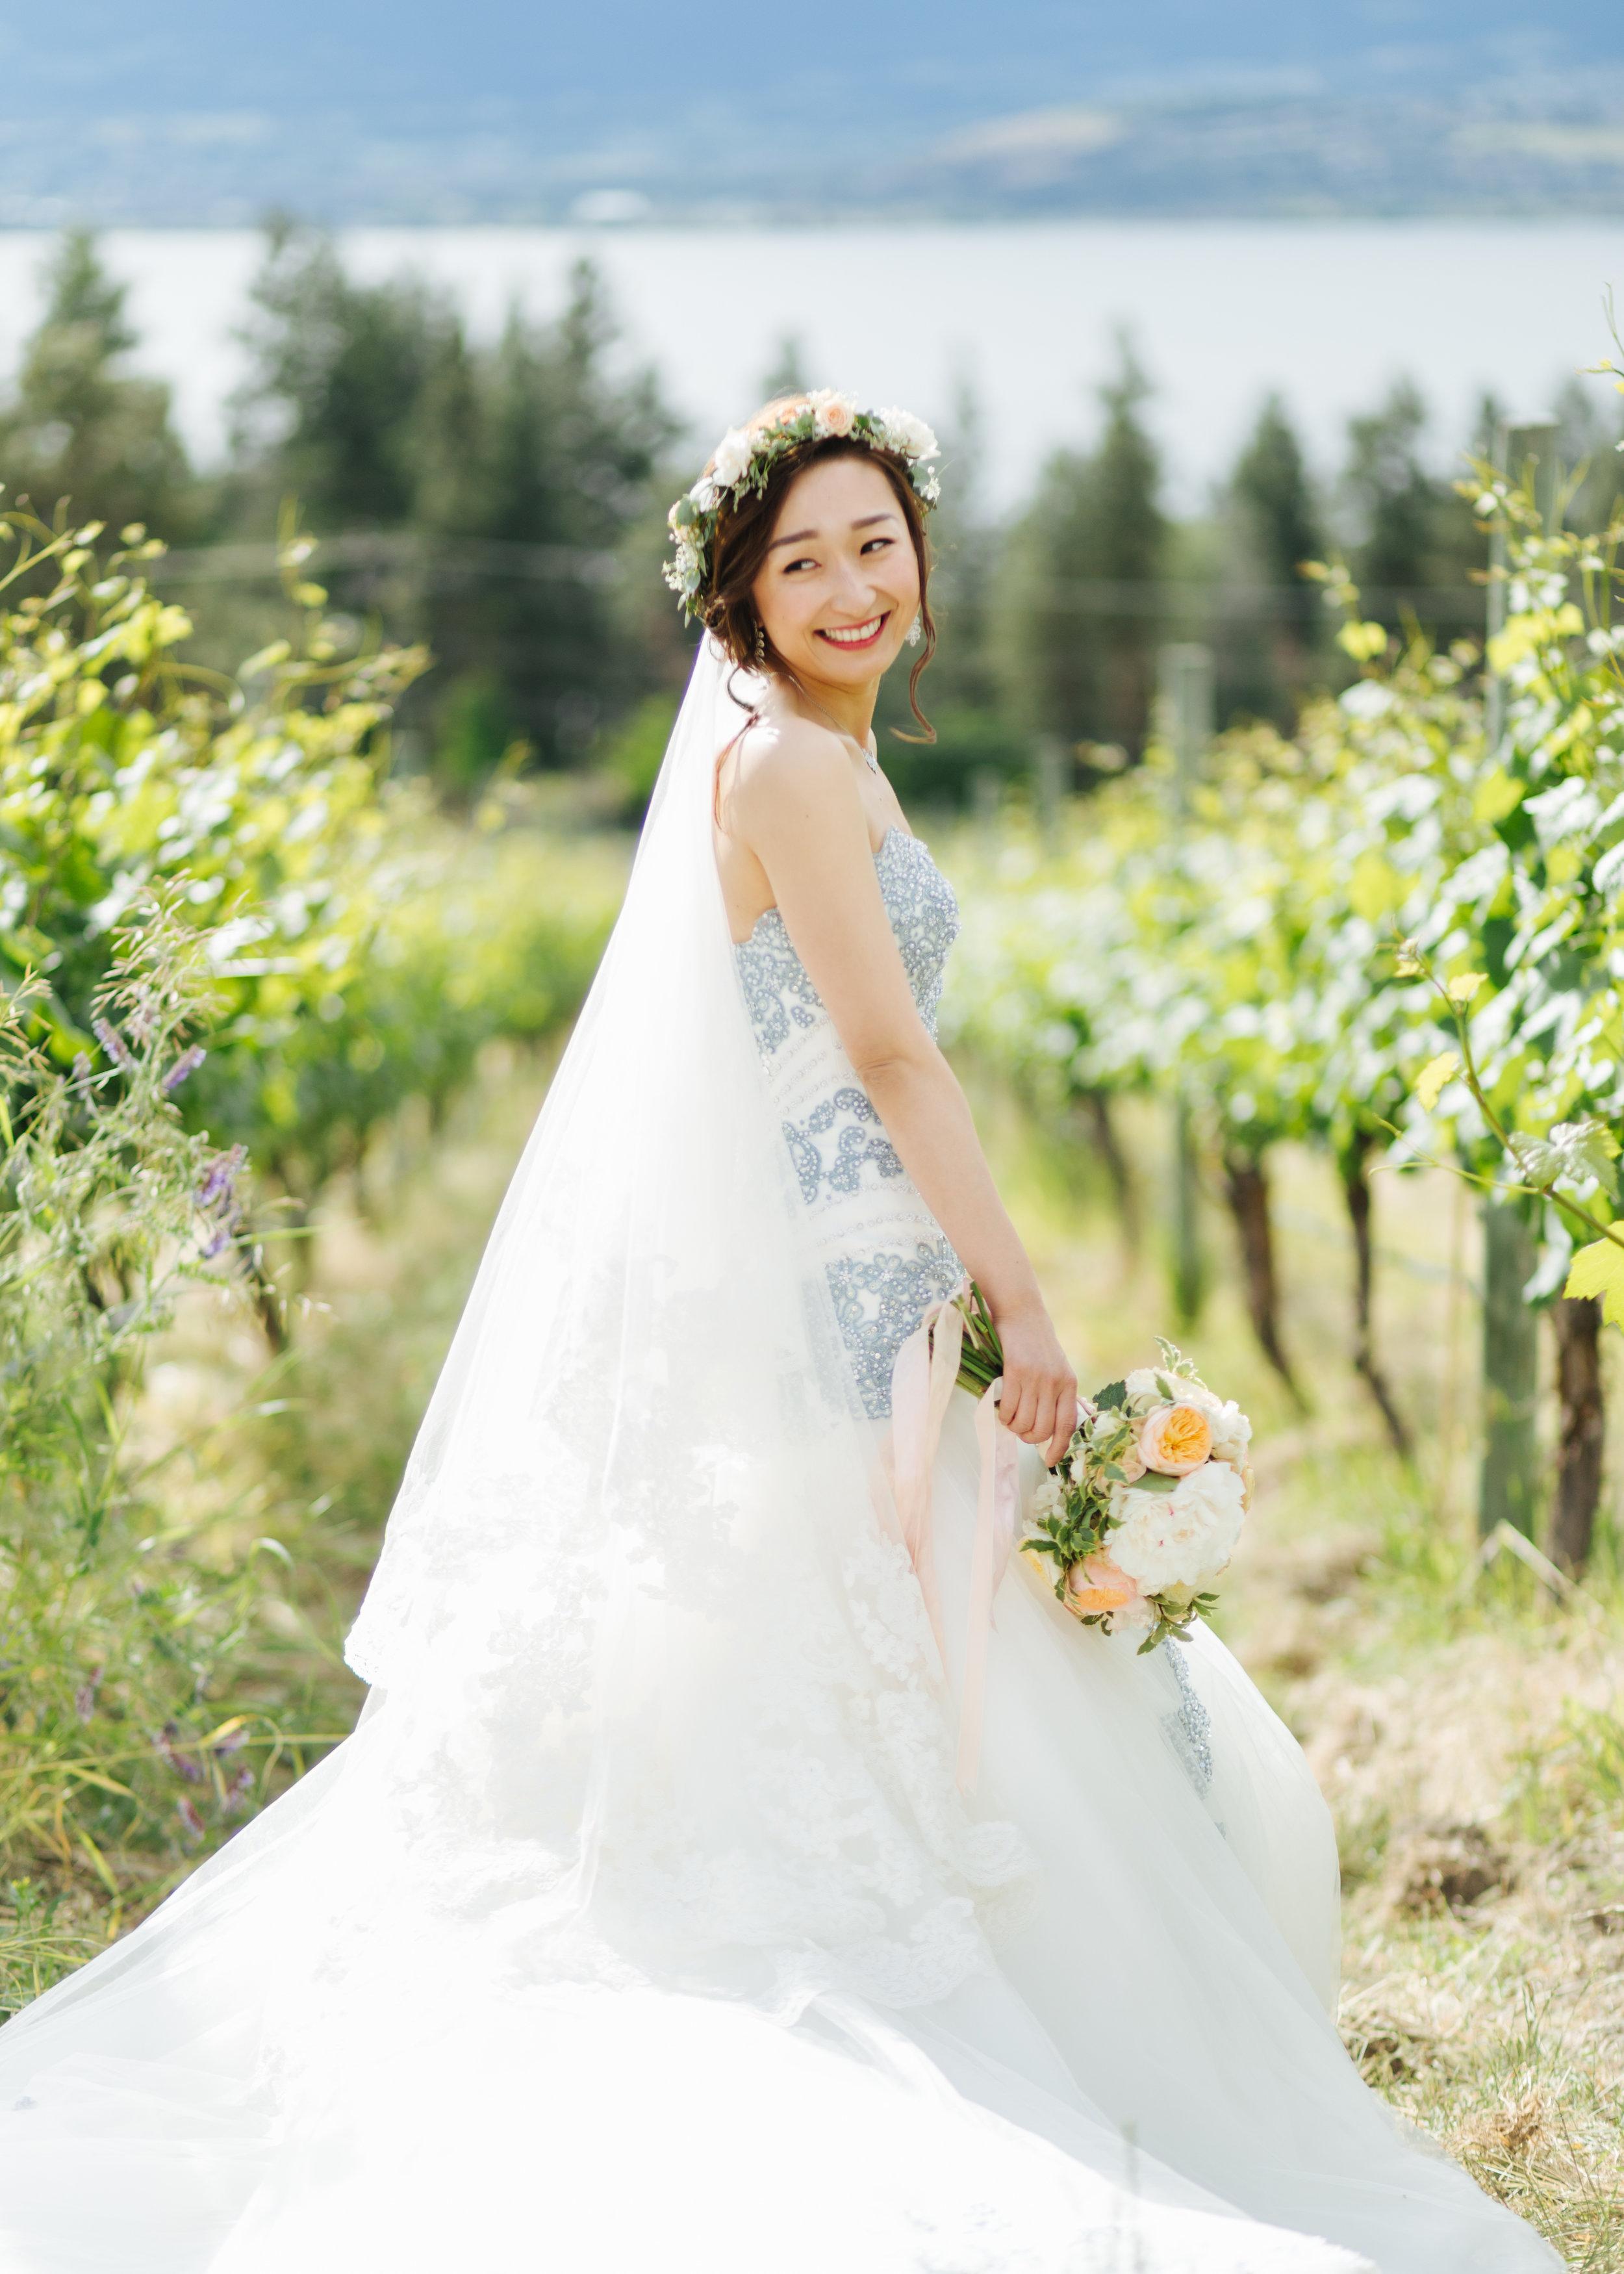 herastudios_wedding_jill_ivan_hera_selects-36.jpg